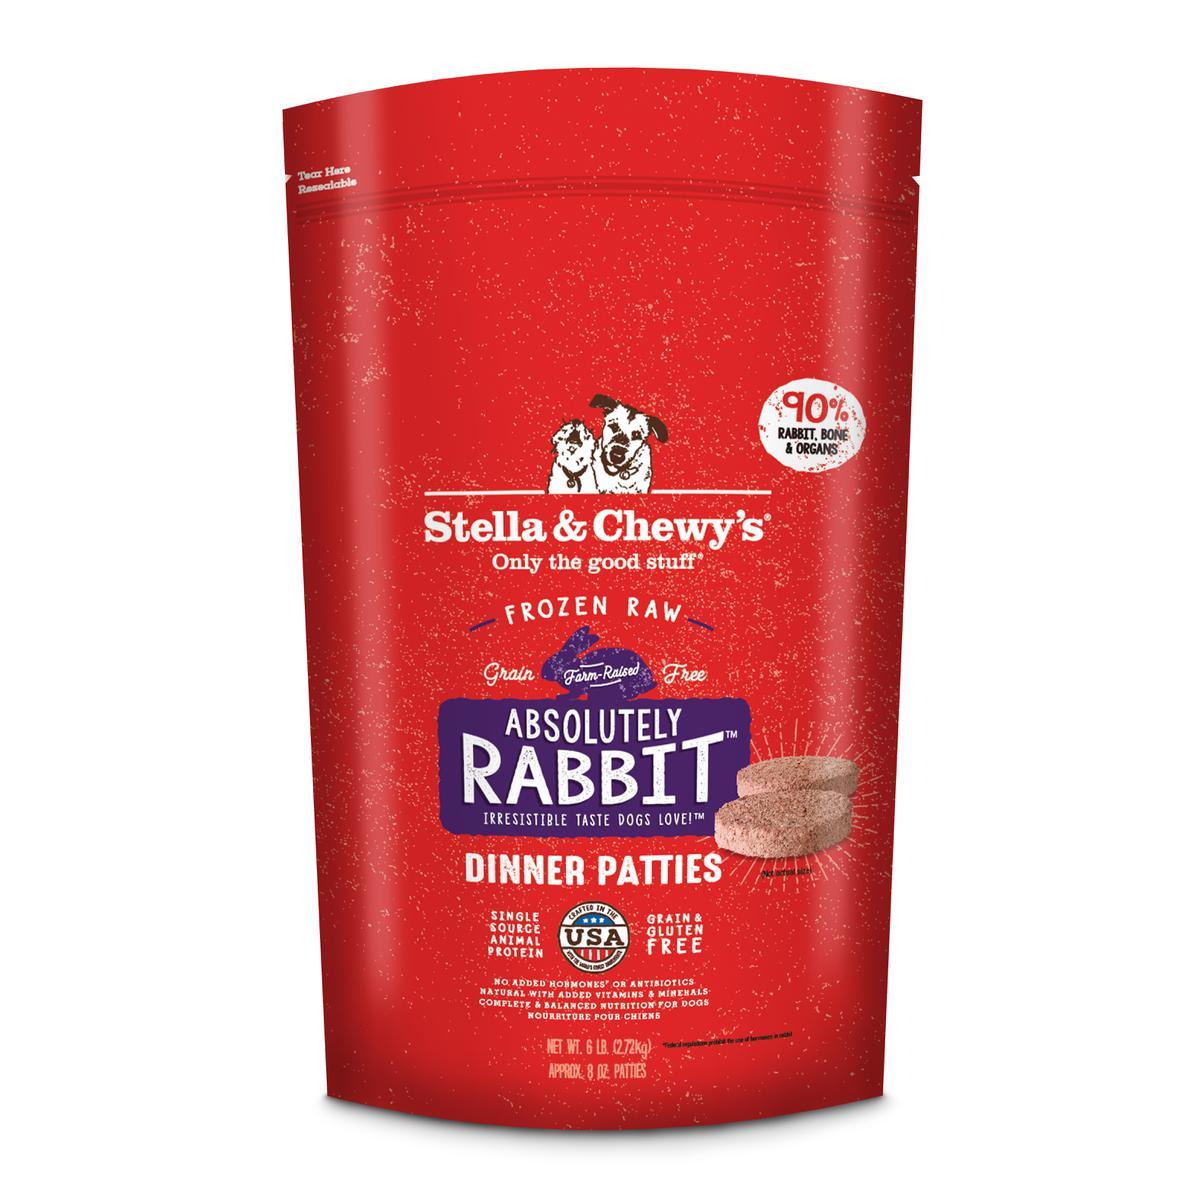 Stella & Chewy's Absolutely Rabbit 8z Dinner Patties Raw Frozen Dog Food, 6-lb